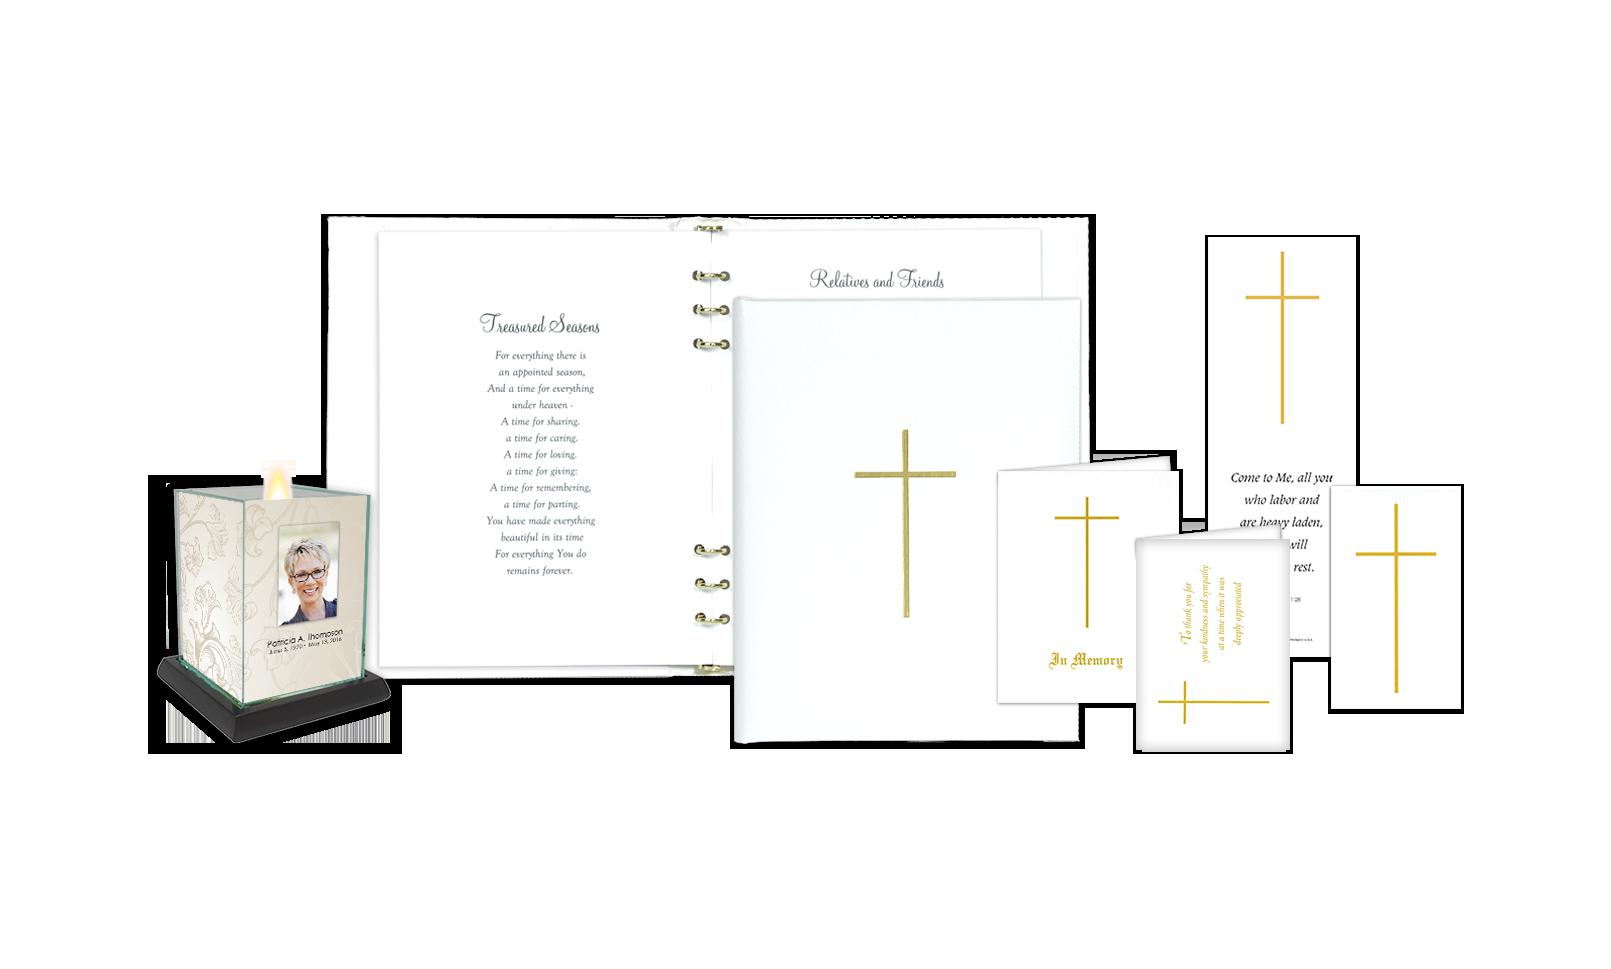 ROL White Cross Series 278 VL